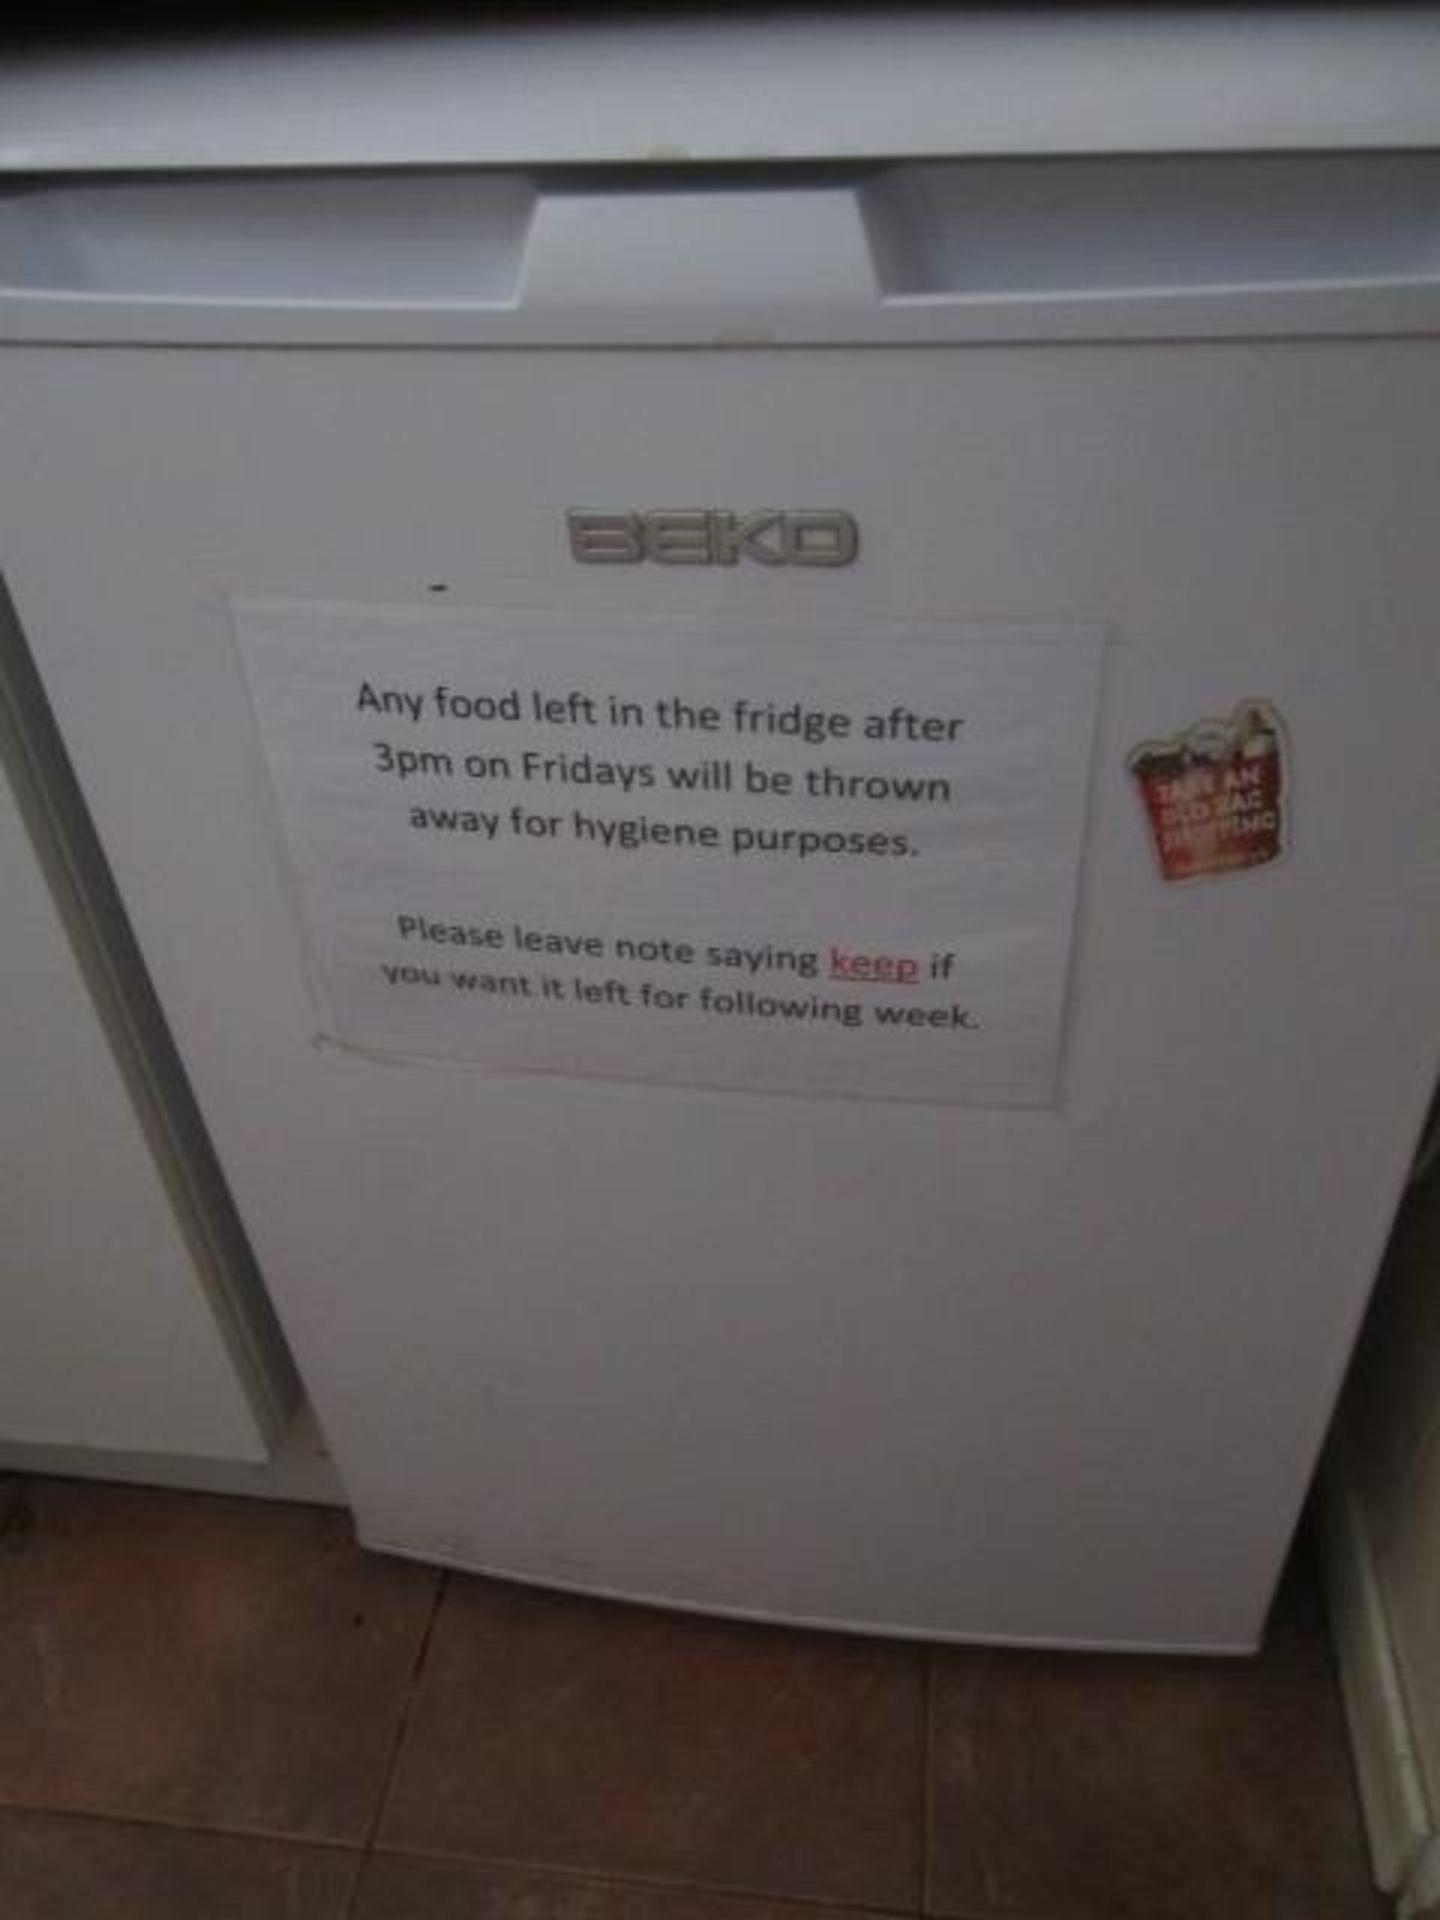 Beko dishwasher, Delonghi microwave oven, toaster, Instanta stainless steel water dispenser, Beko - Image 2 of 4